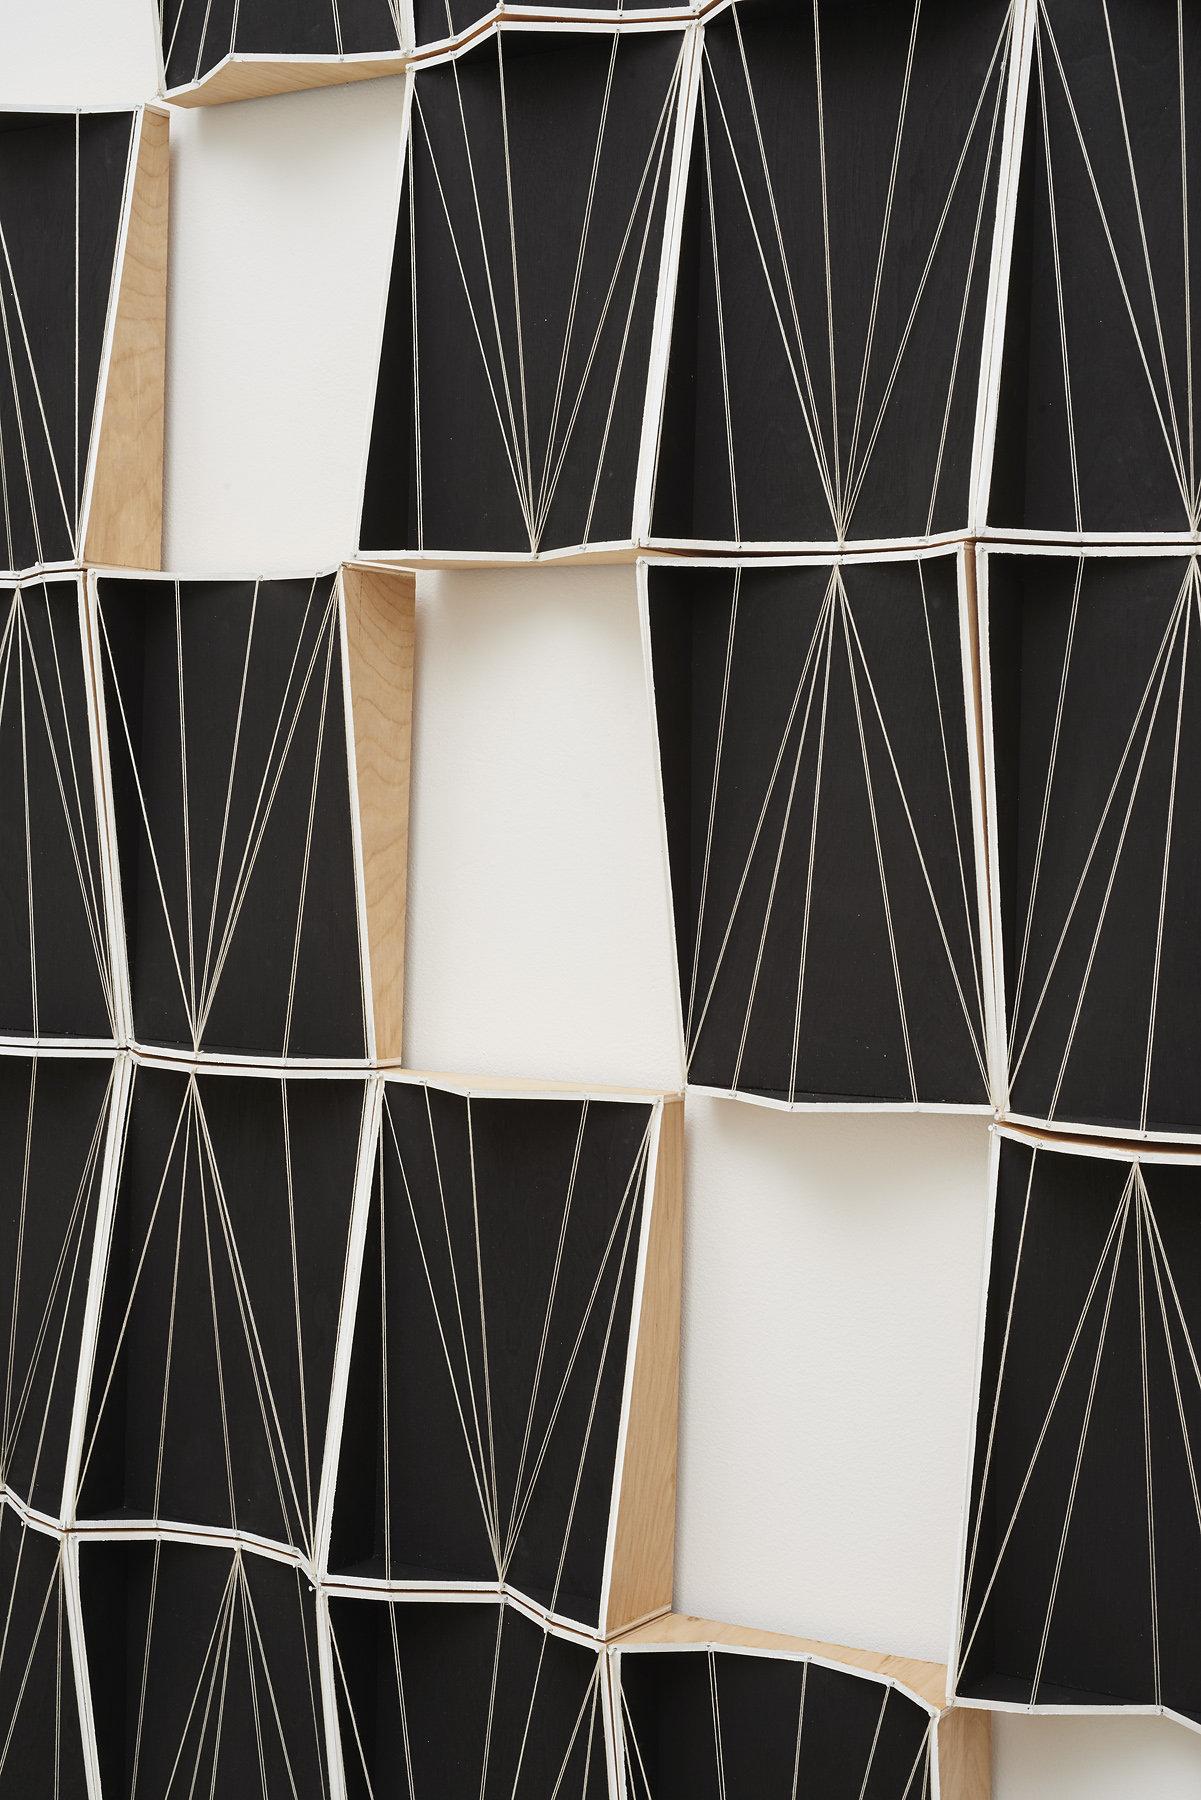 72.Hoeber_Going Nowhere Vector Model, Bas Relief Tile, Second Level Complexity, Negative Spaces, 2015